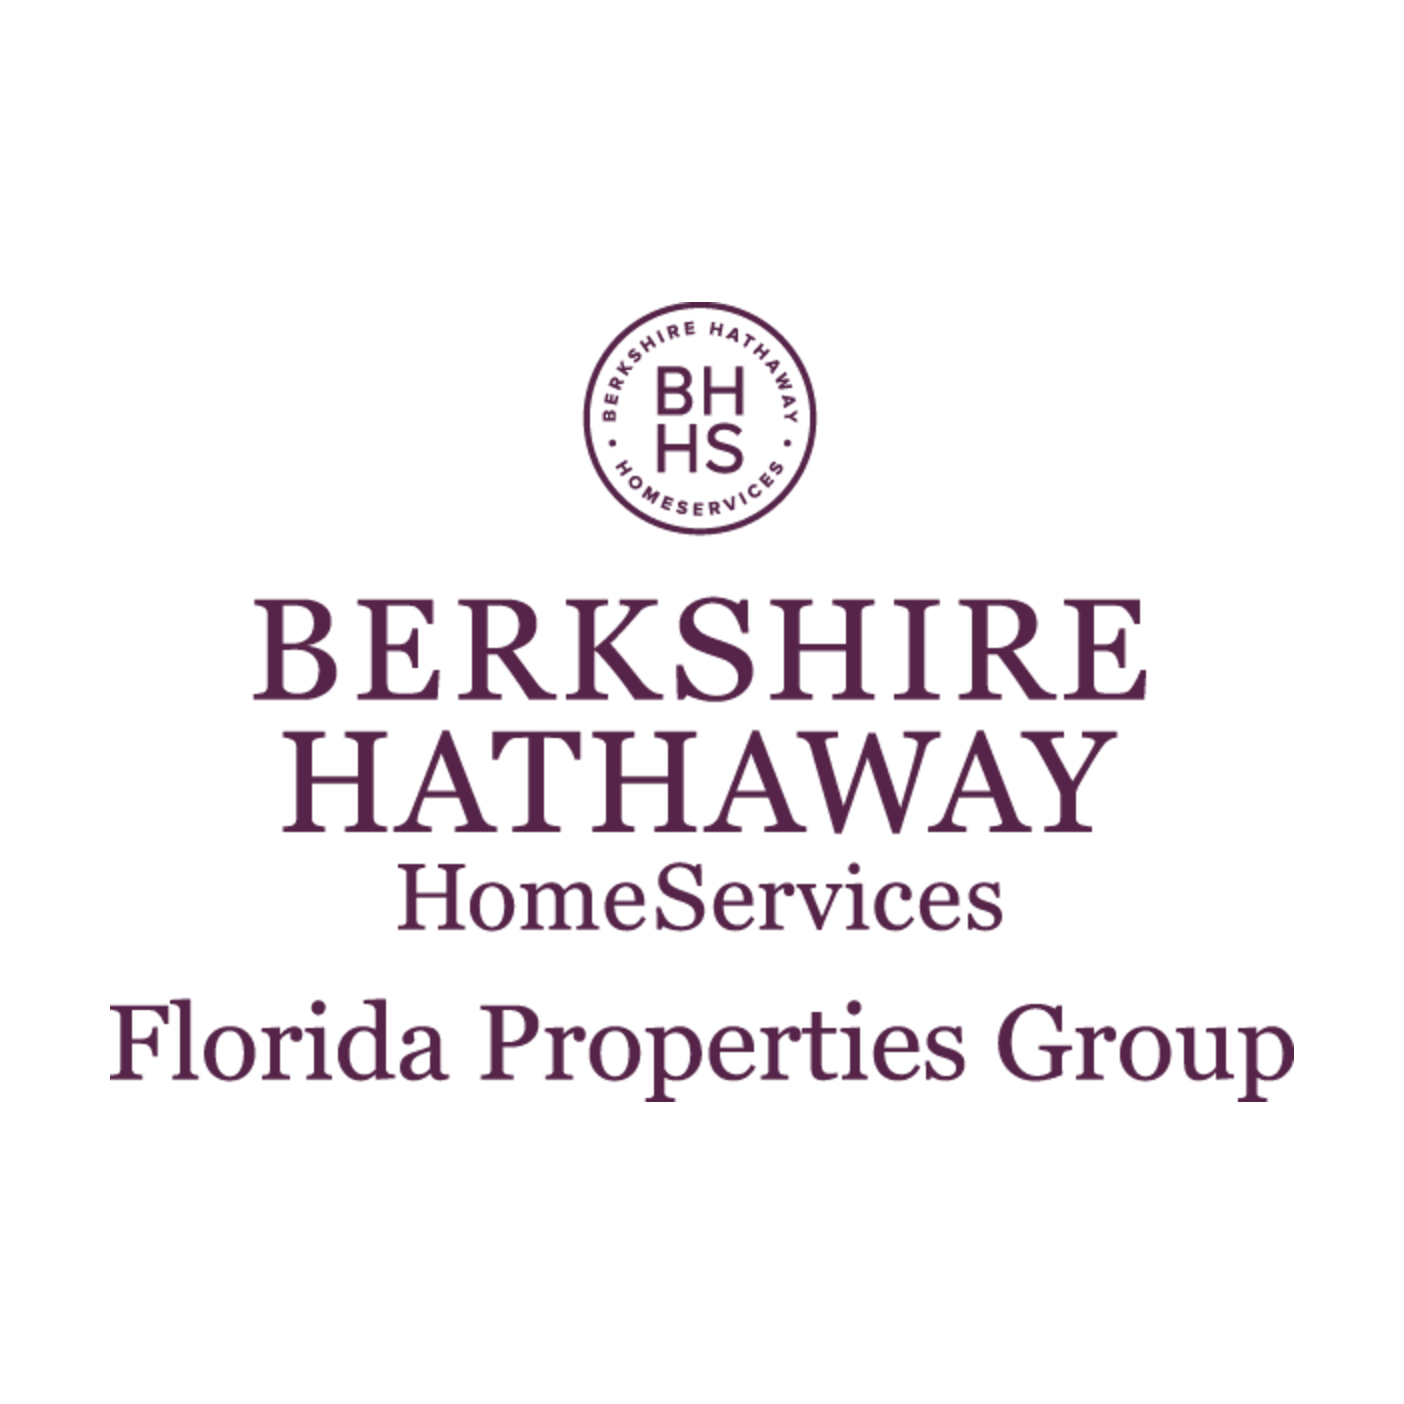 Marybeth Payor - Berkshire Hathaway HomeServices Florida Properties Group